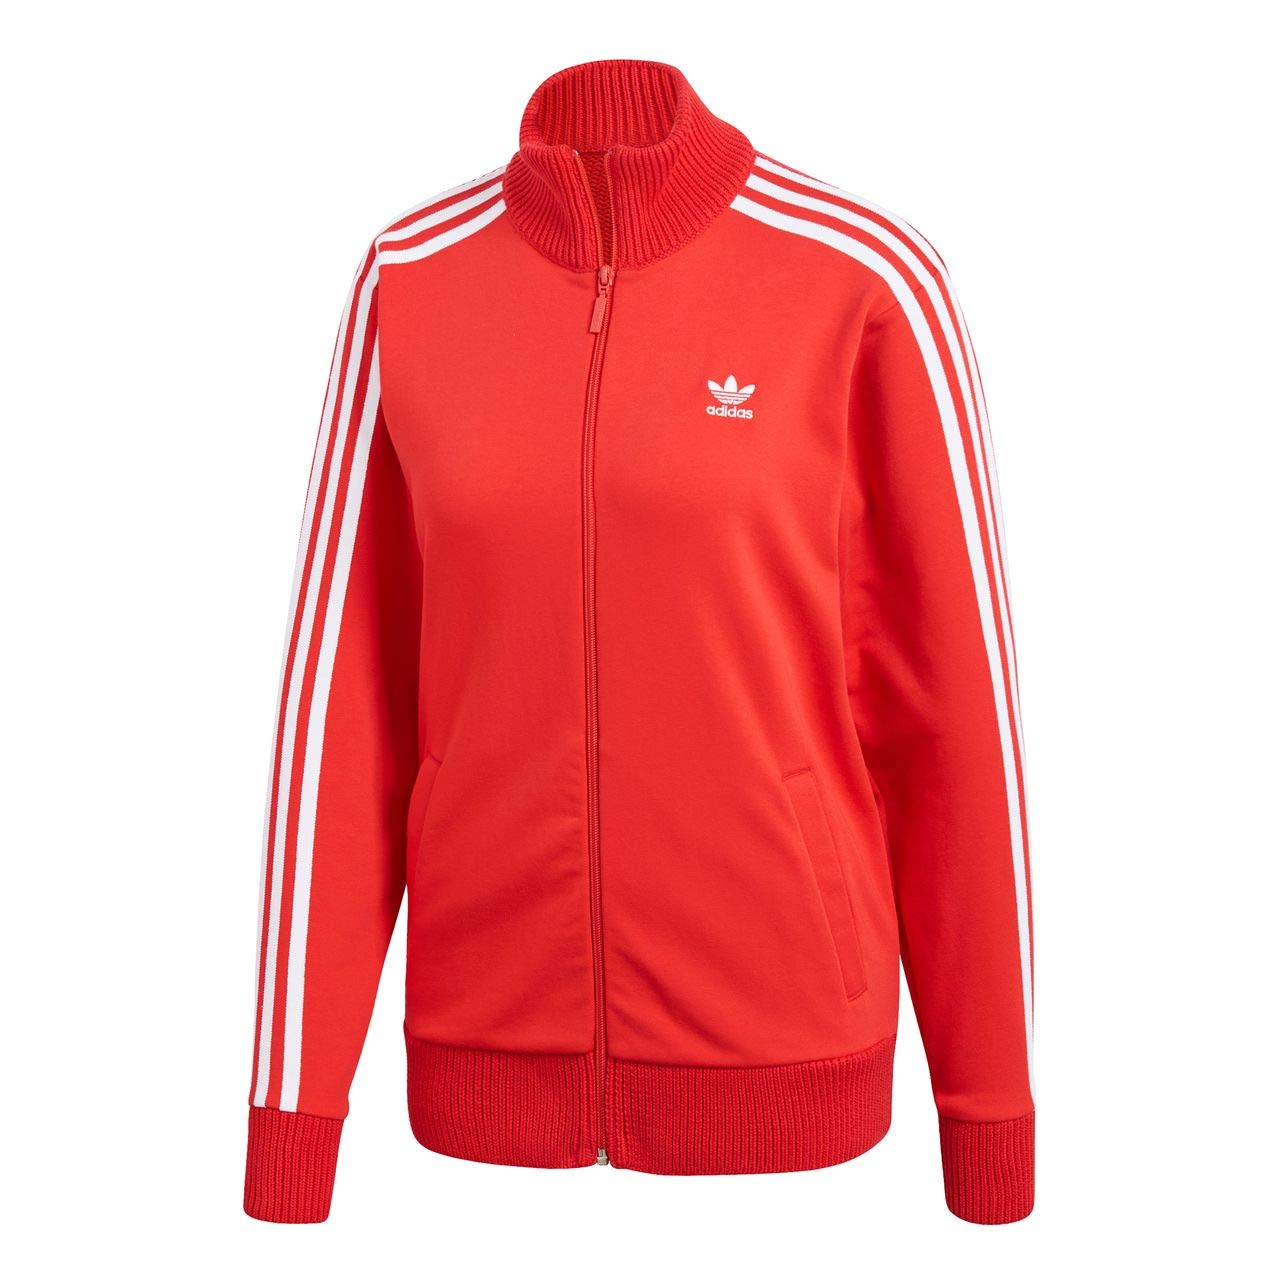 Adidas Tracktop, Sweatjacke, Damen, Tracktop